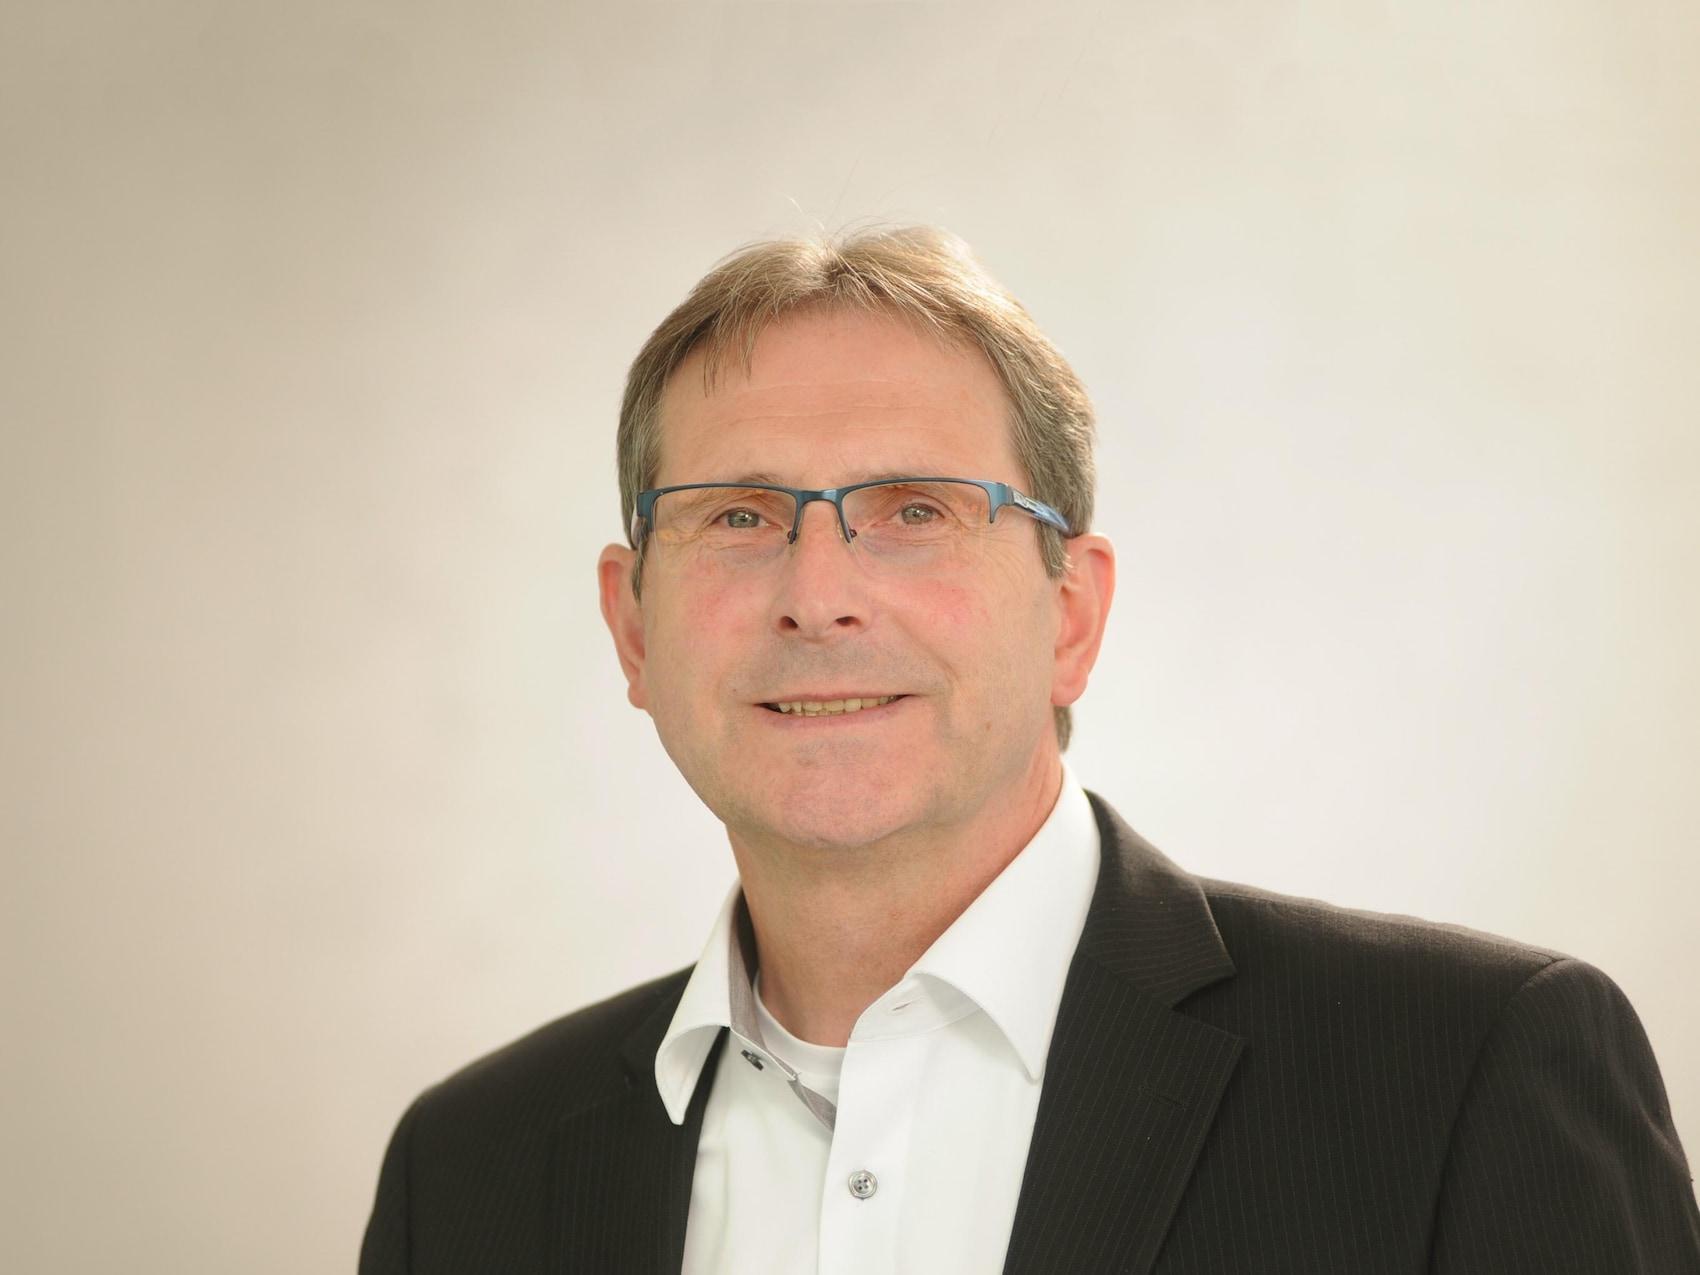 smart Center Pirmasens - Geschäftsführer: Siegfried-Glutting